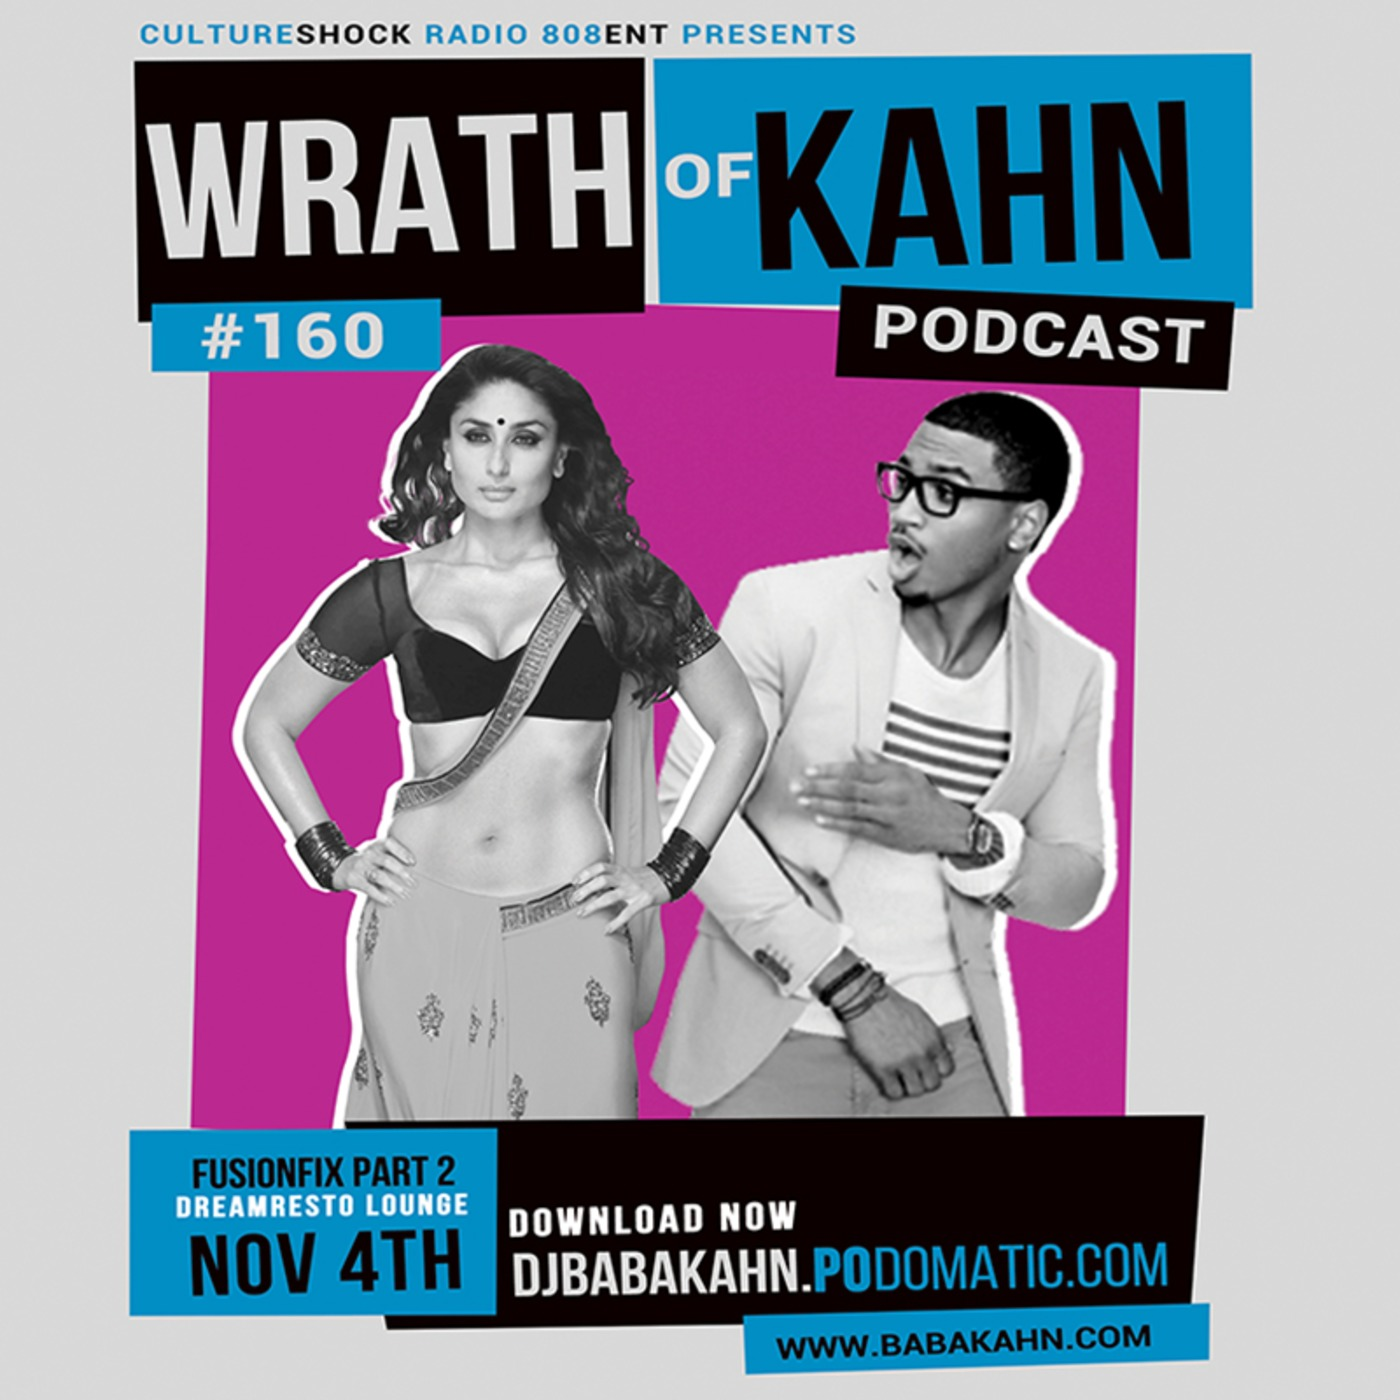 Wrath Of Kahn 160 DJ Baba Kahn DJ BABA KAHN podcast